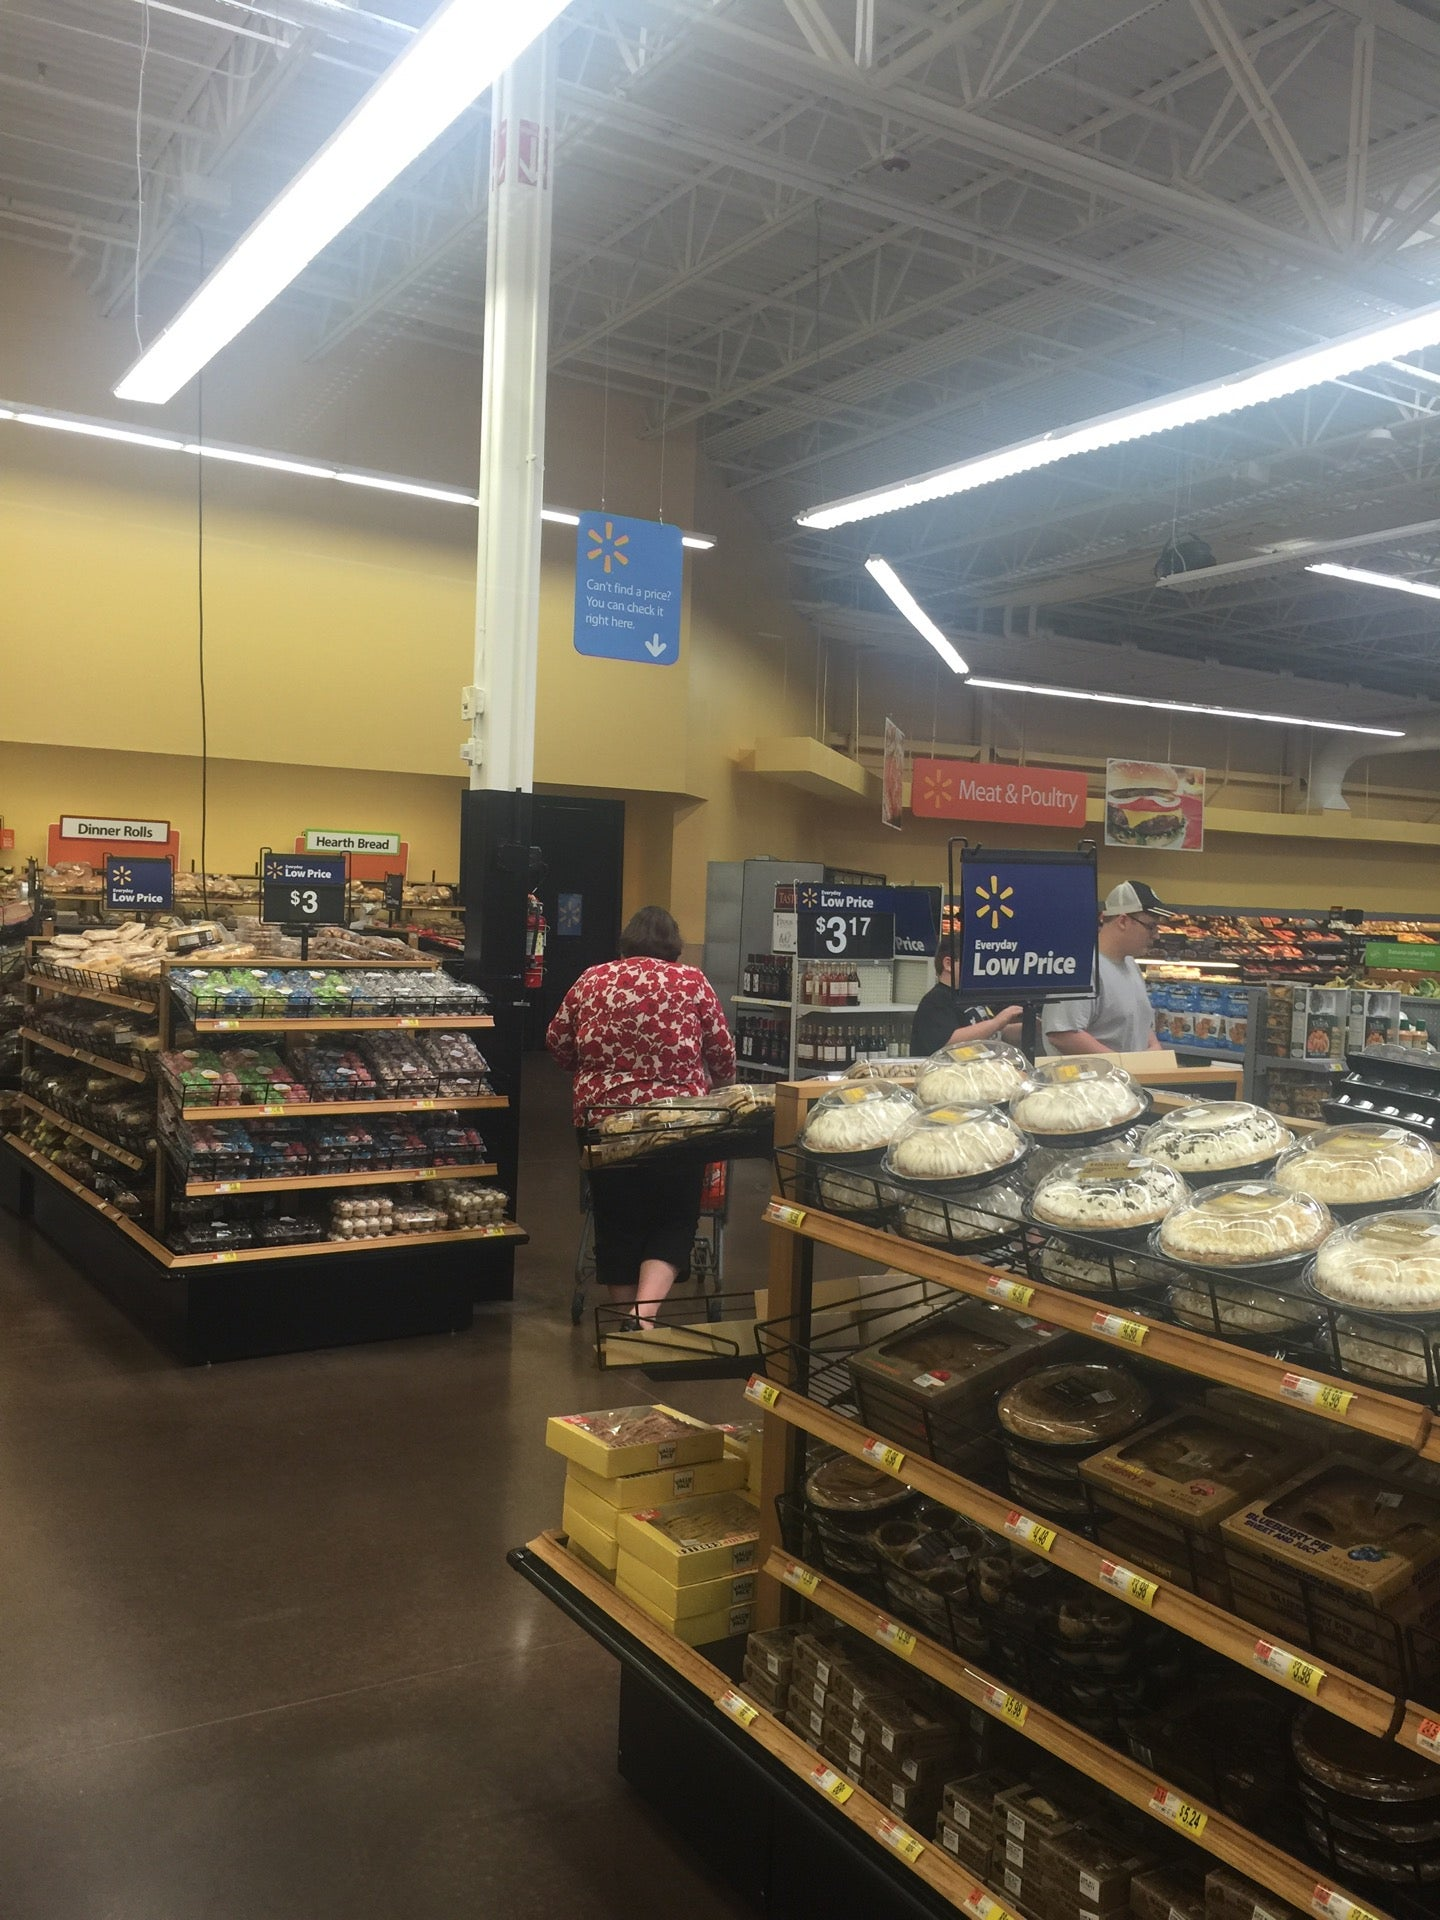 Walmart,Neighborhood Market,Supercenter,Wal-Mart,Wally World,Walmart,grocery